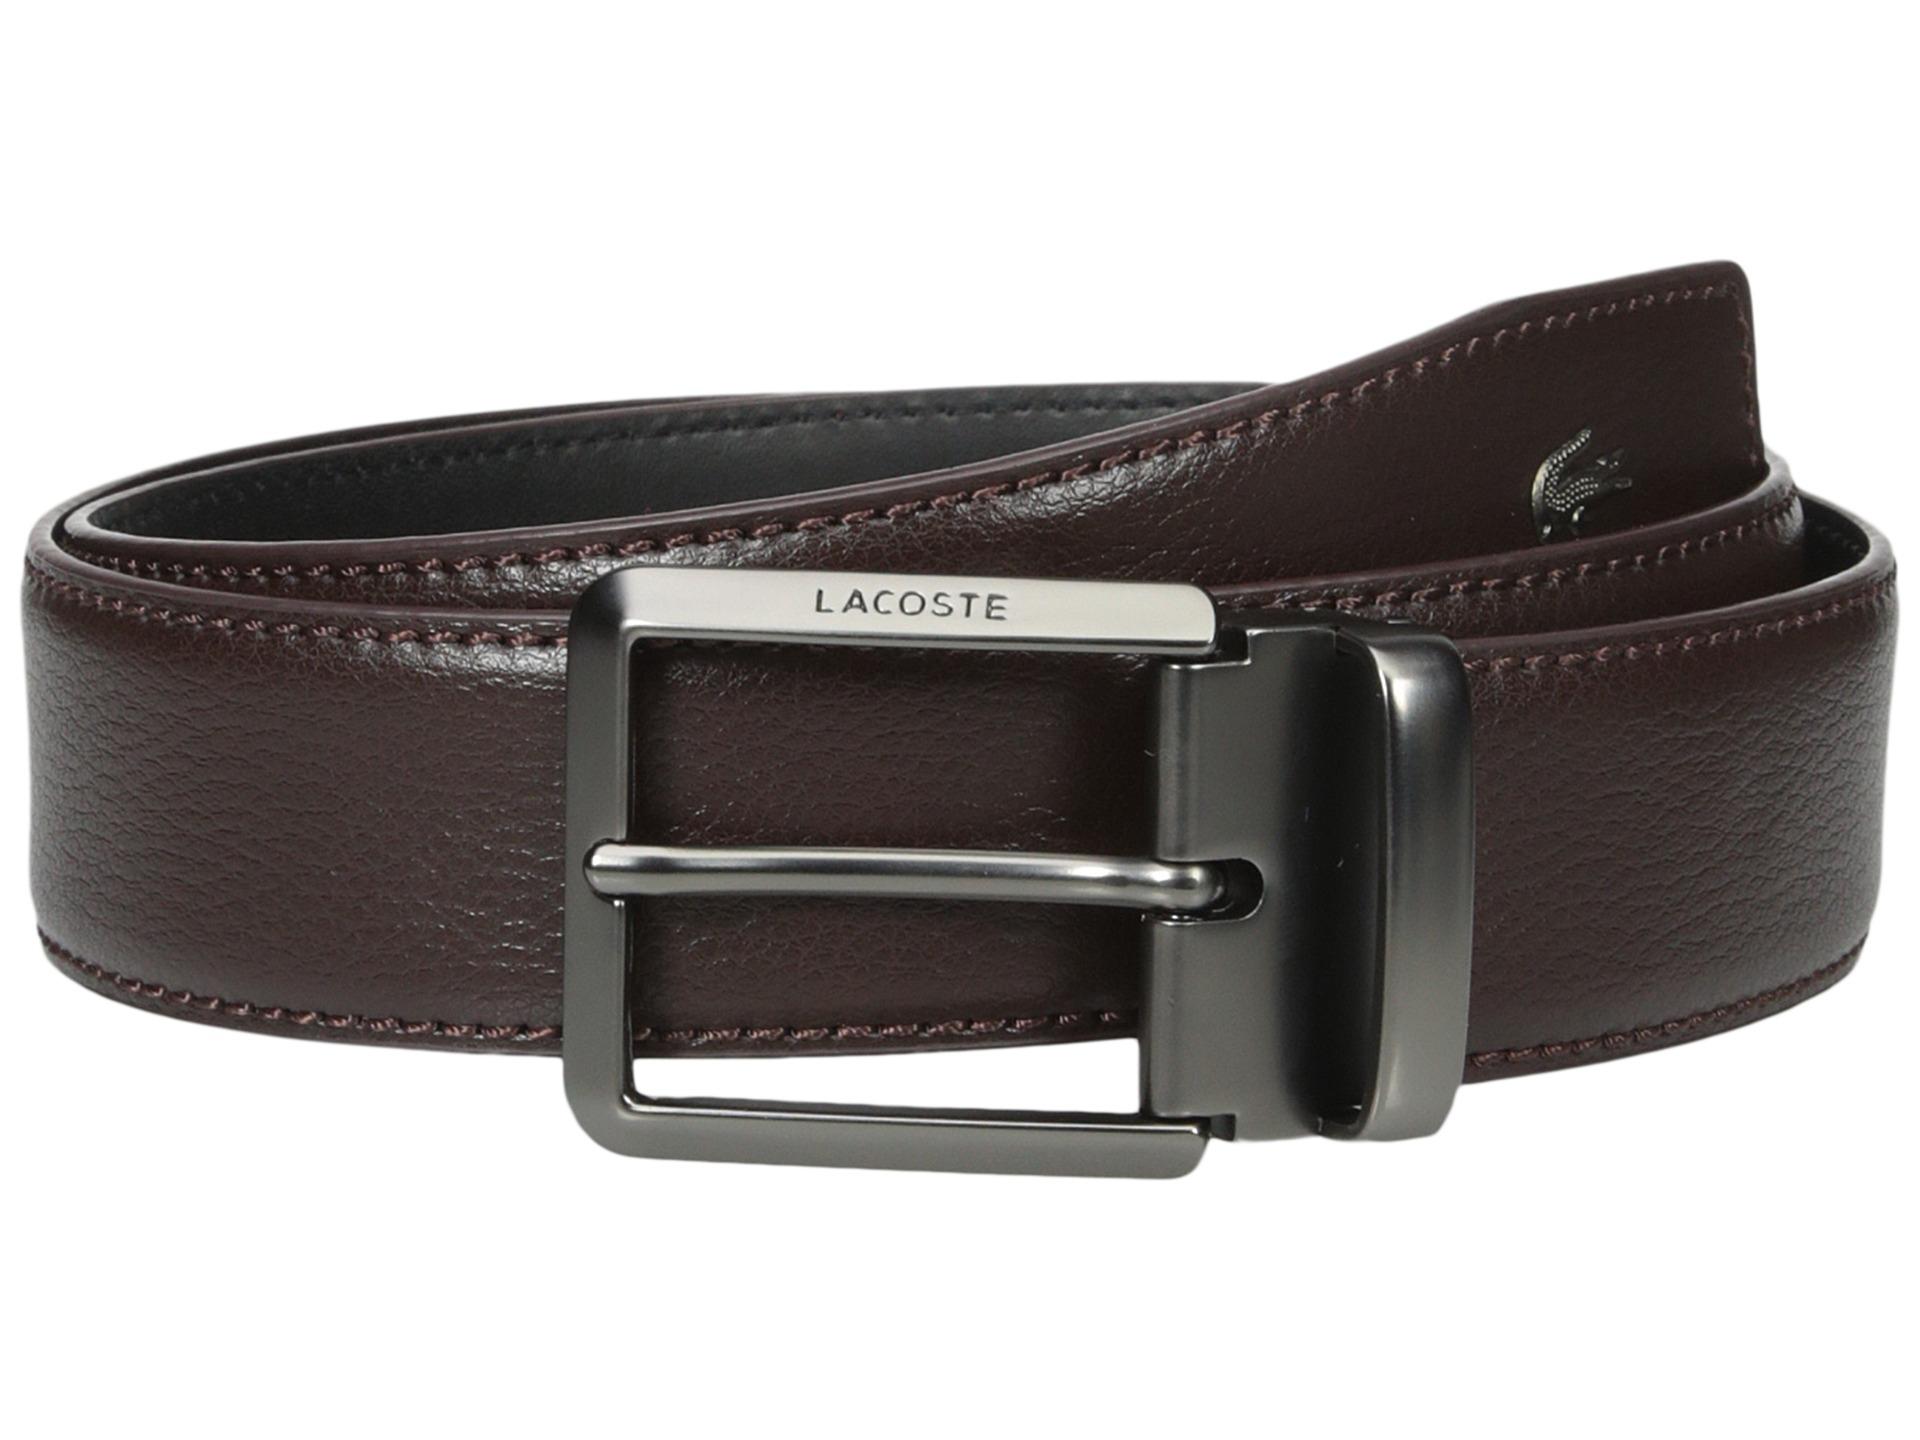 lacoste premium leather metal croc belt in black for